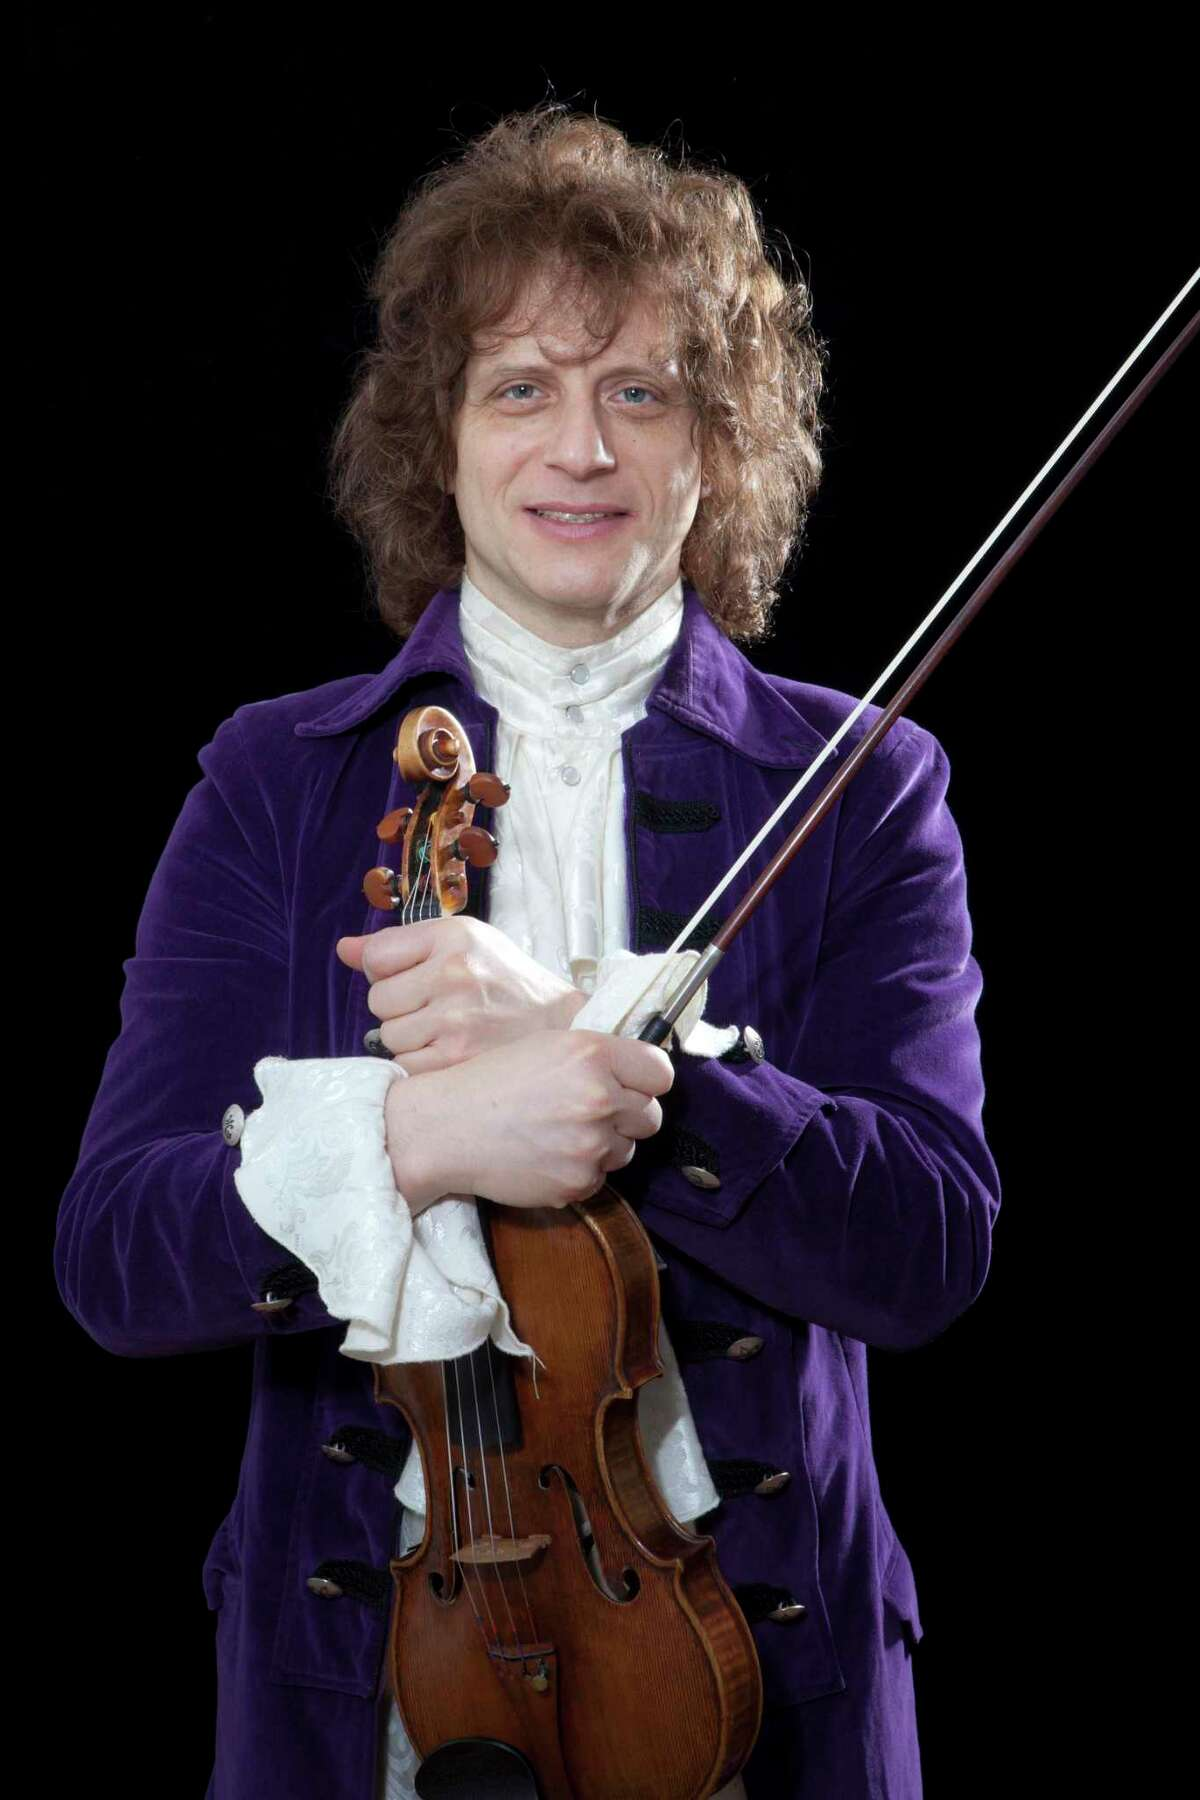 Alex Markov will perform on Nov. 8 at the Norwalk Concert Hall.